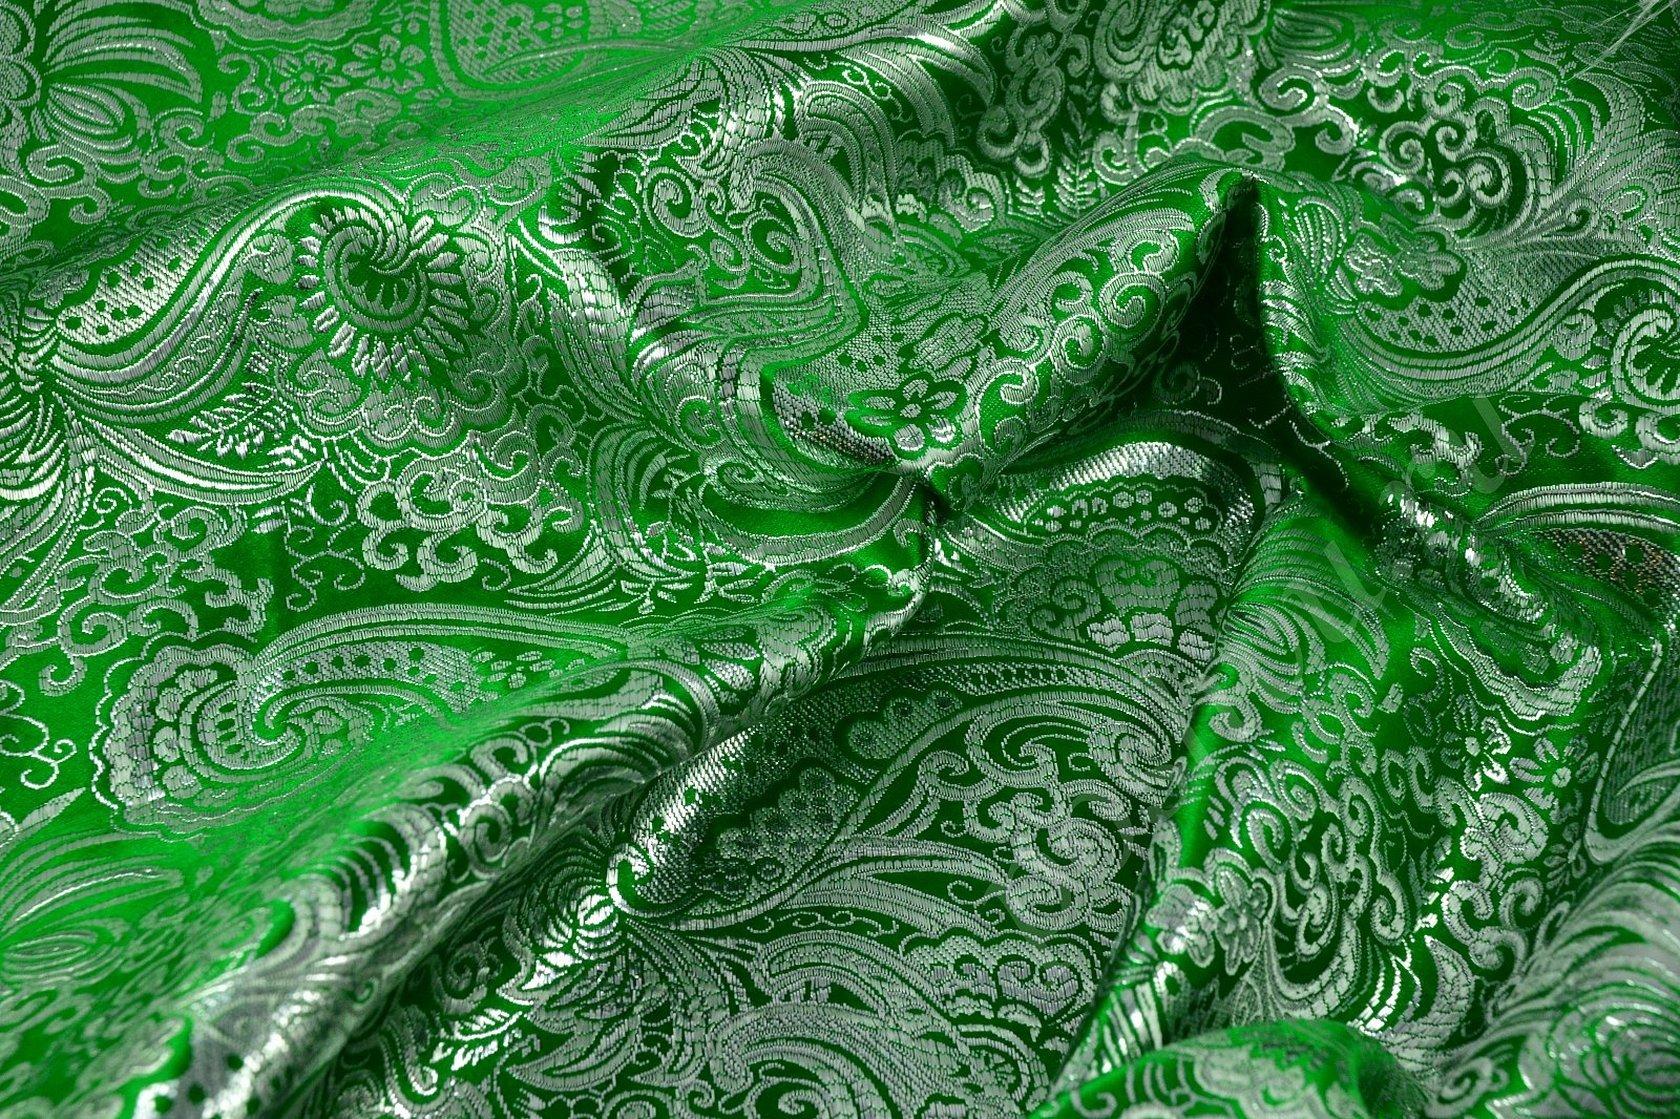 Ткань парча зеленая с узором